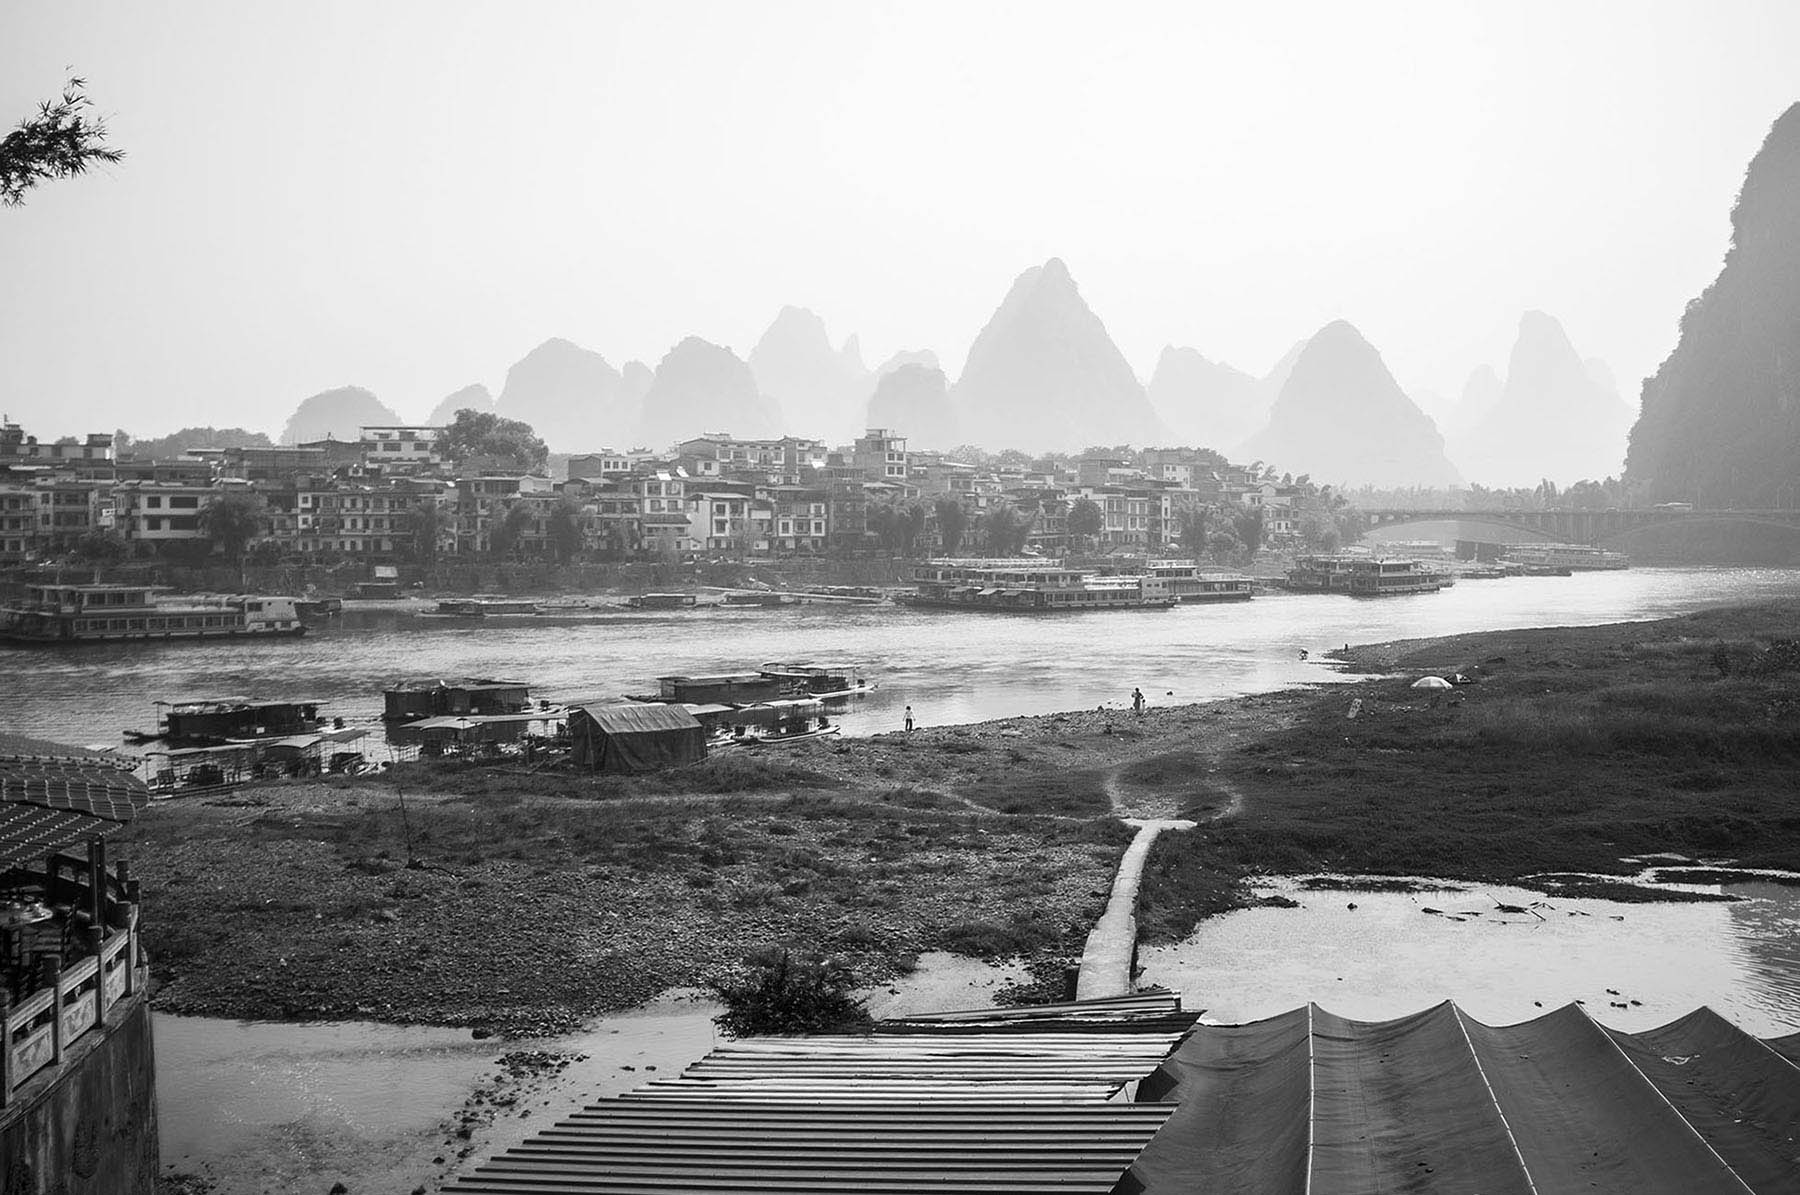 View on the River Li.